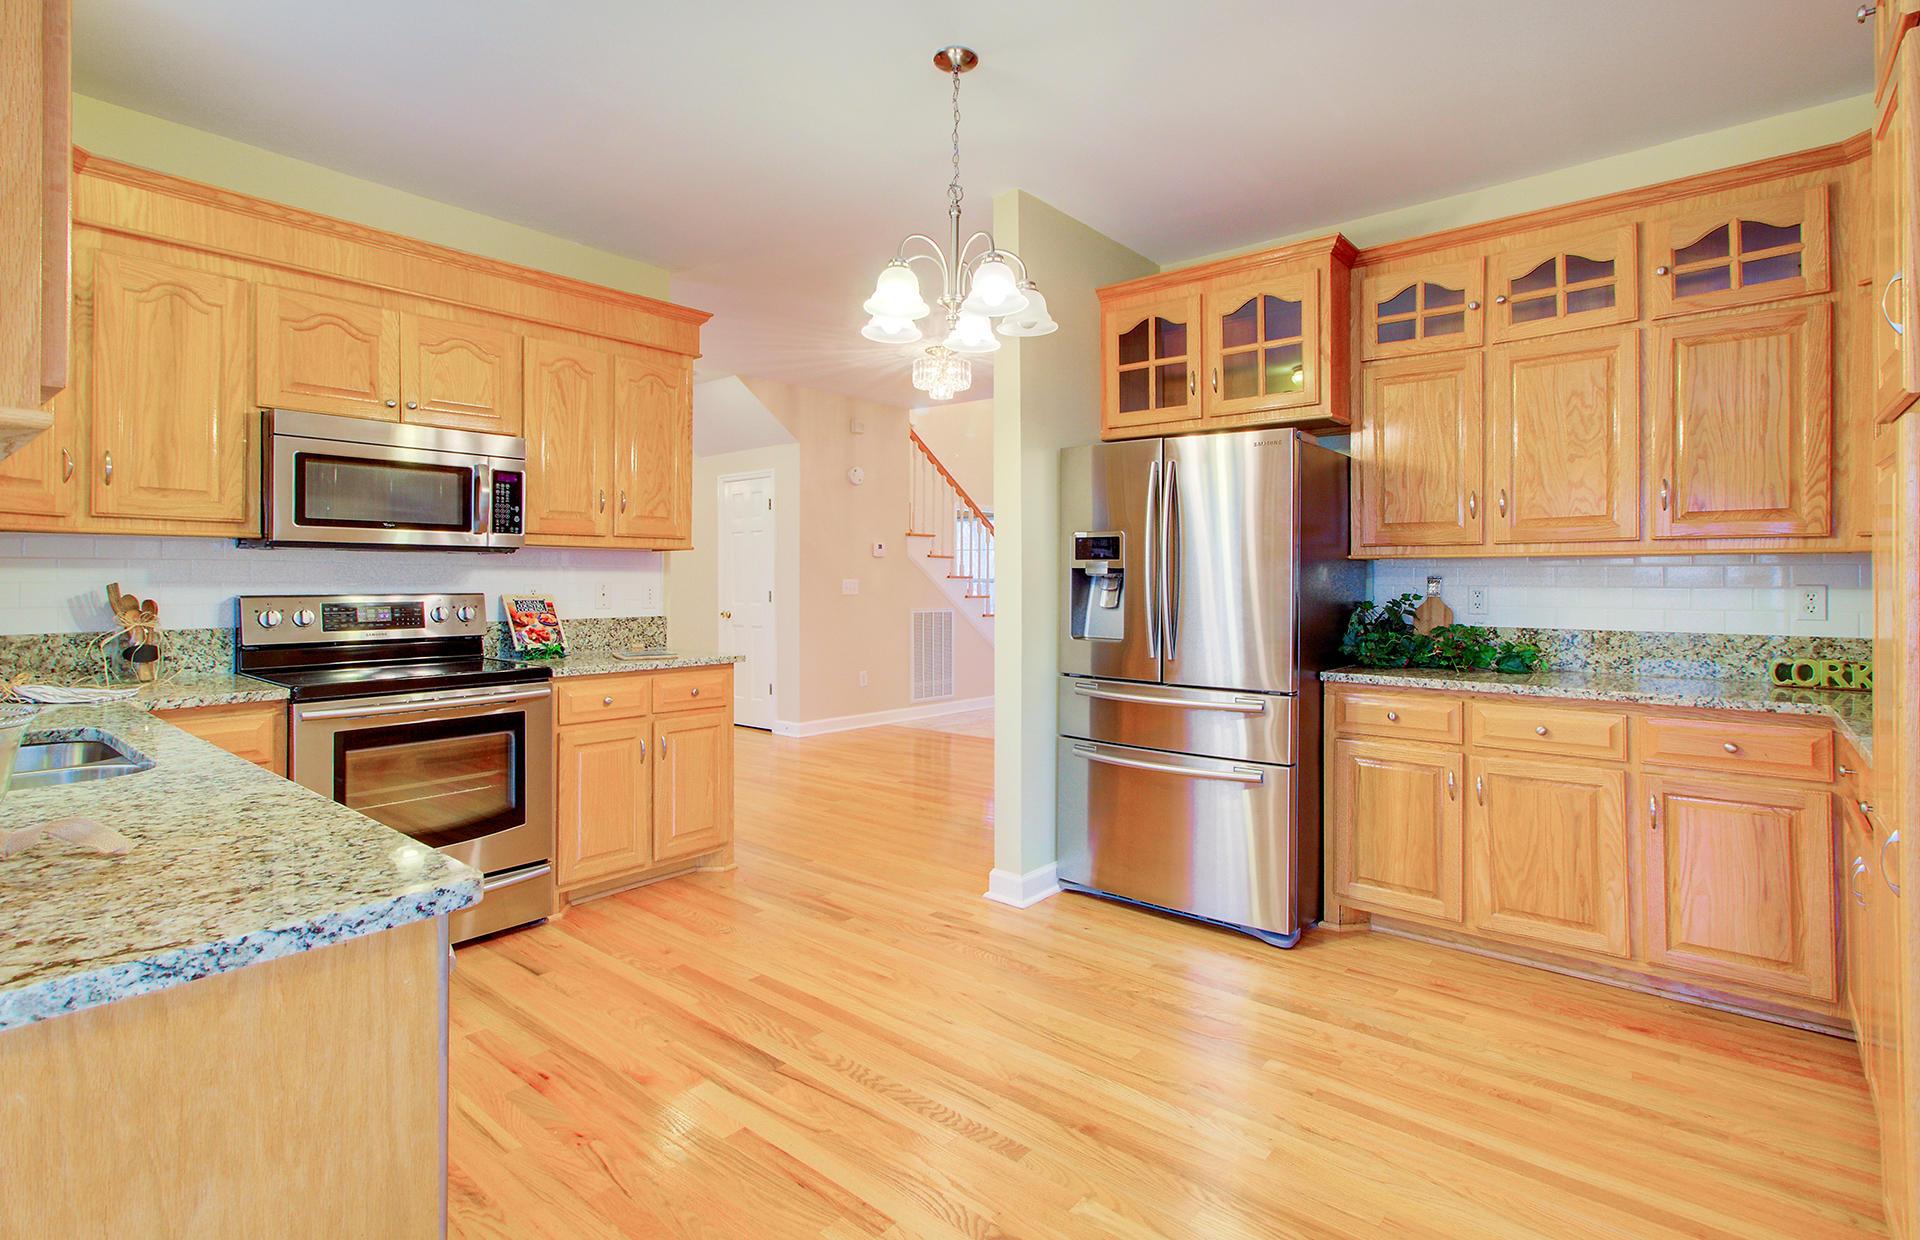 Bakers Landing Homes For Sale - 105 River Oak, North Charleston, SC - 45